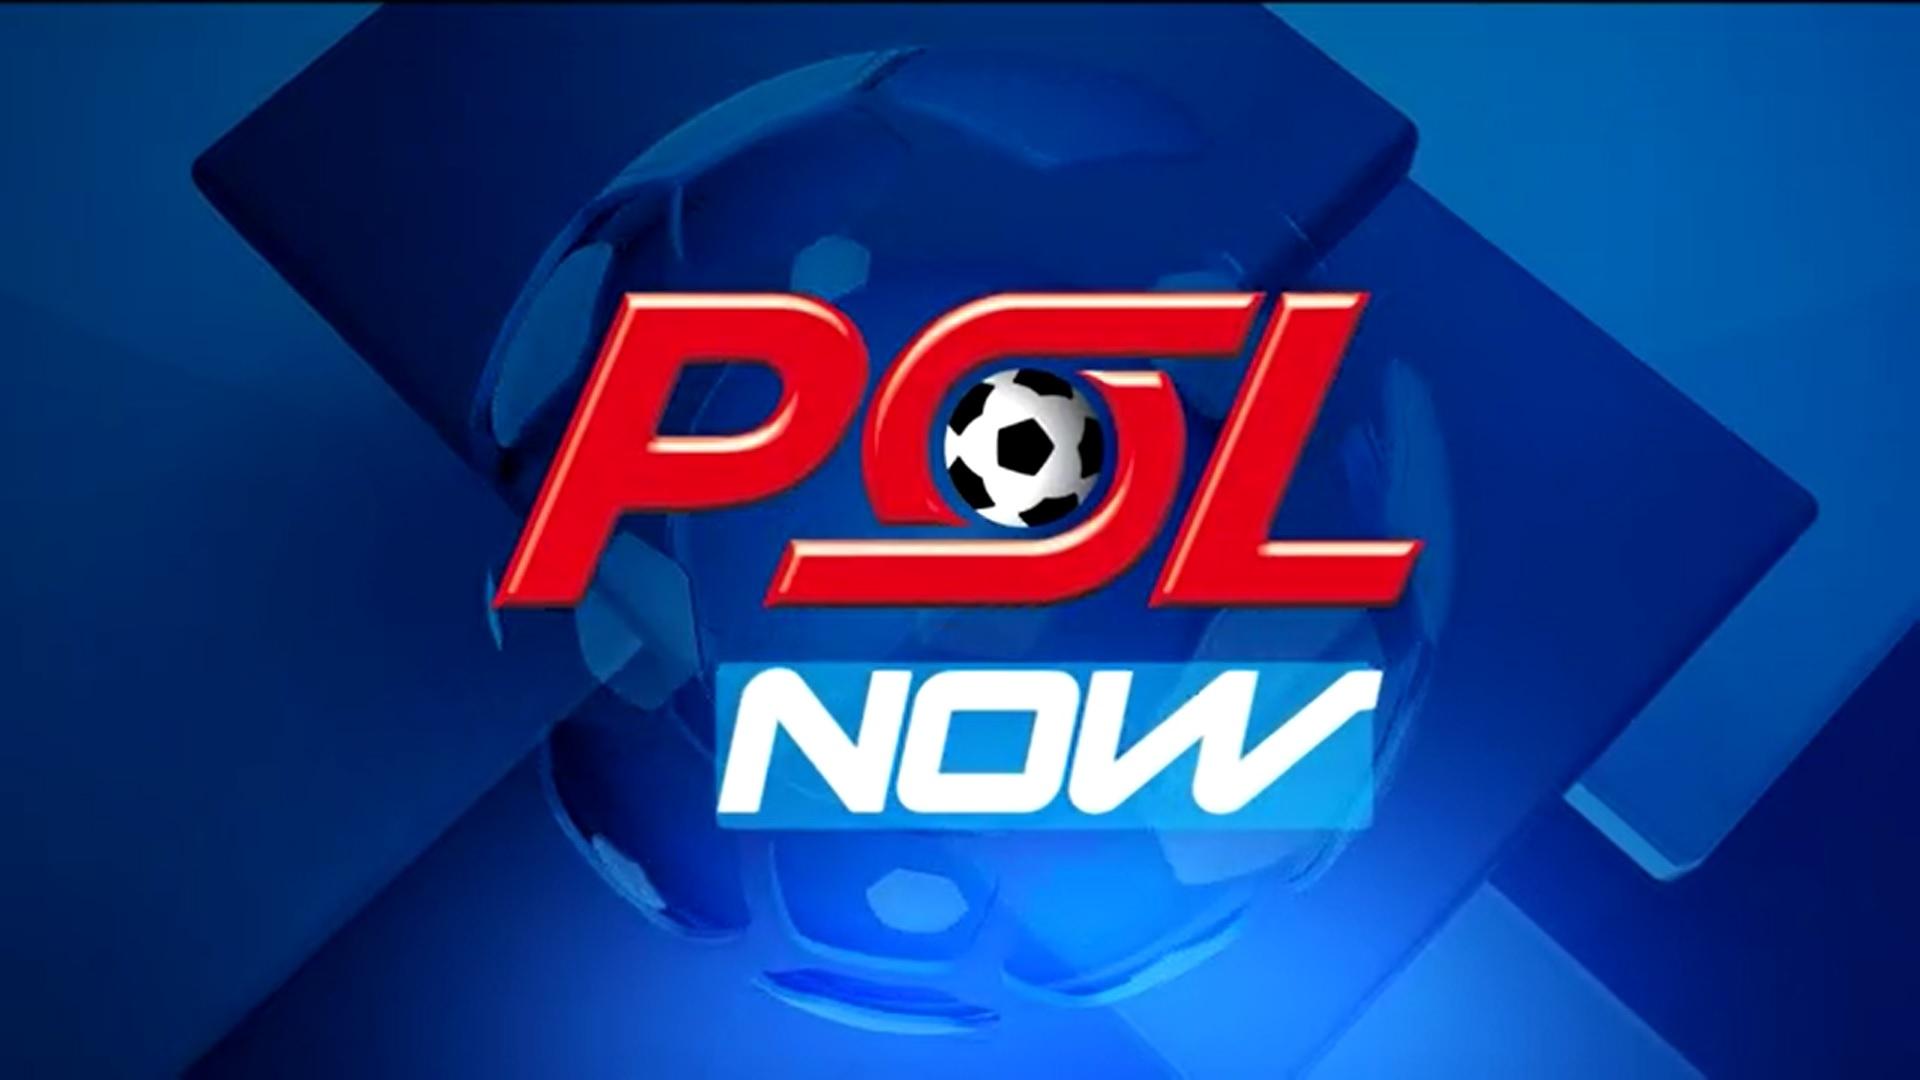 DStv Premiership | PSL Now | Episode 11